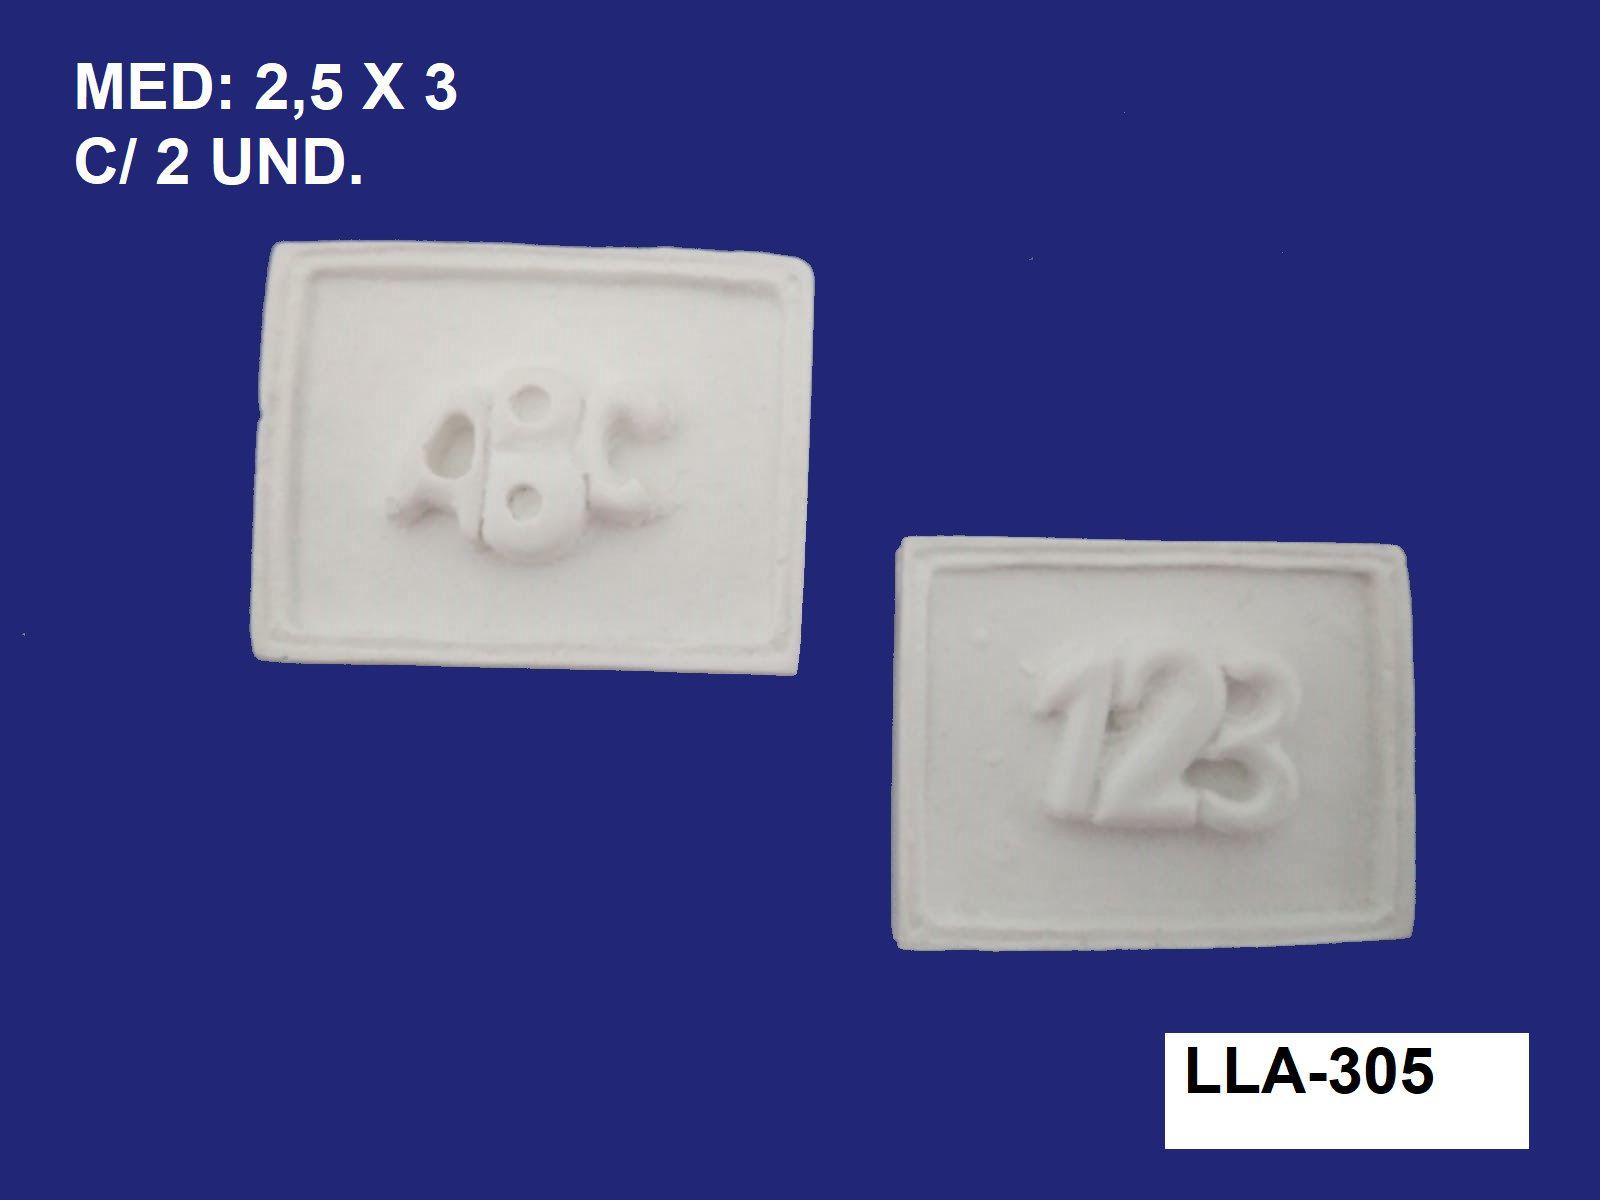 LLA-305 APLIQUE PLAQUINHA ABC E 123 2,5X3CM C/ 2 UND.